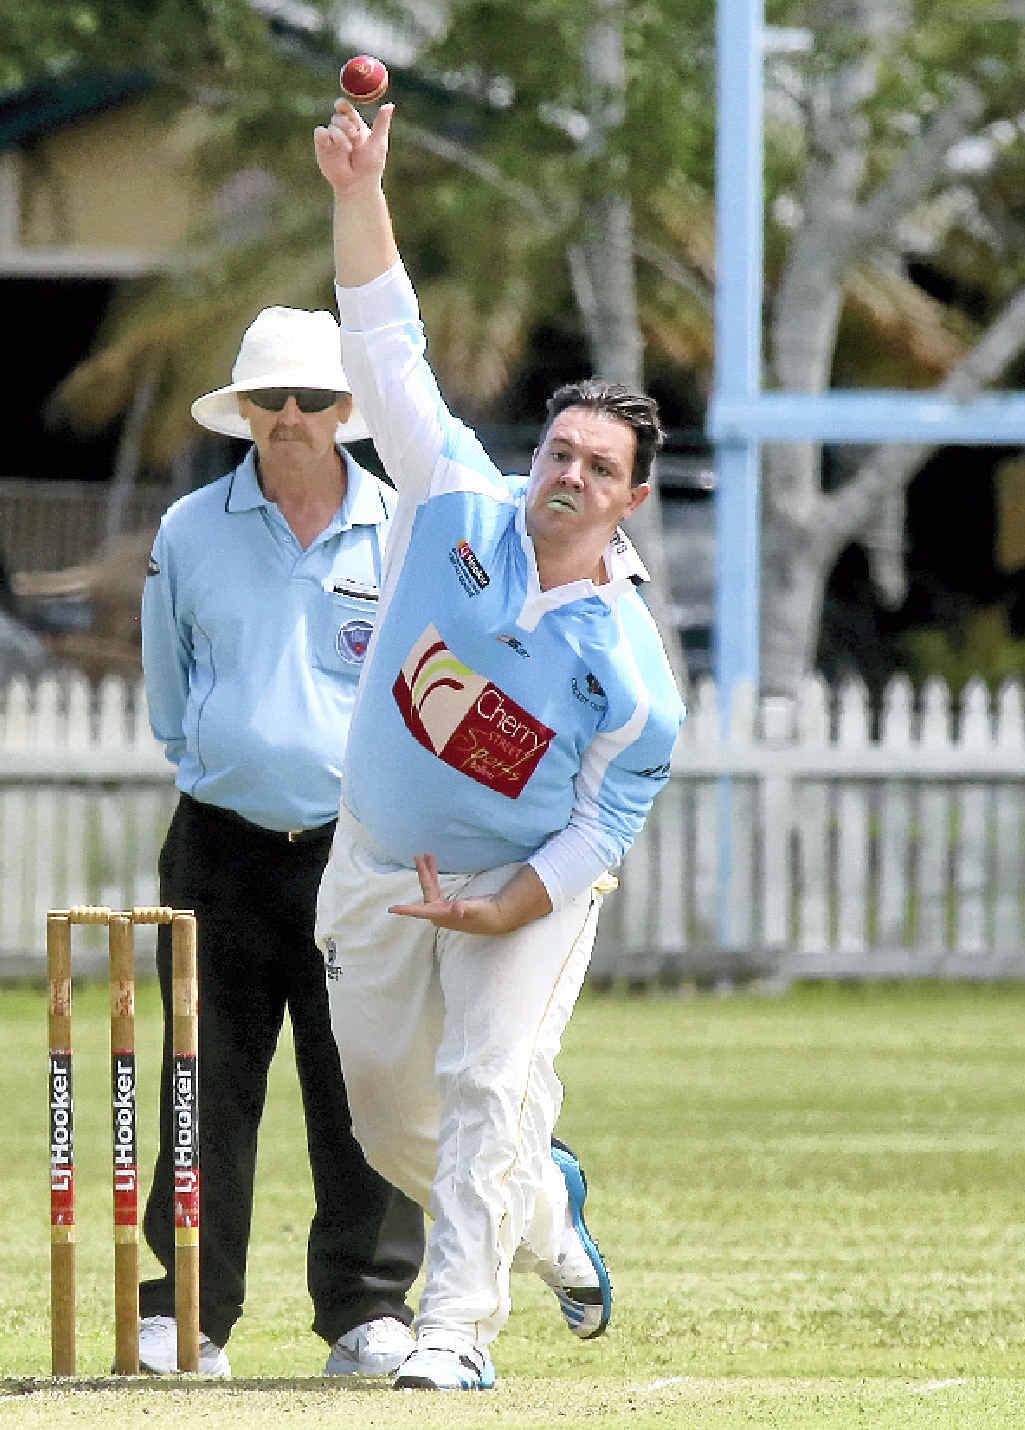 BOWLING BEAR: Leo Anderson sends one down for Ballina Bears in the Hooker League match against Tintenbar-East Ballina at Fripp Oval, Ballina, on Saturday. The umpire is Steve Czisz.